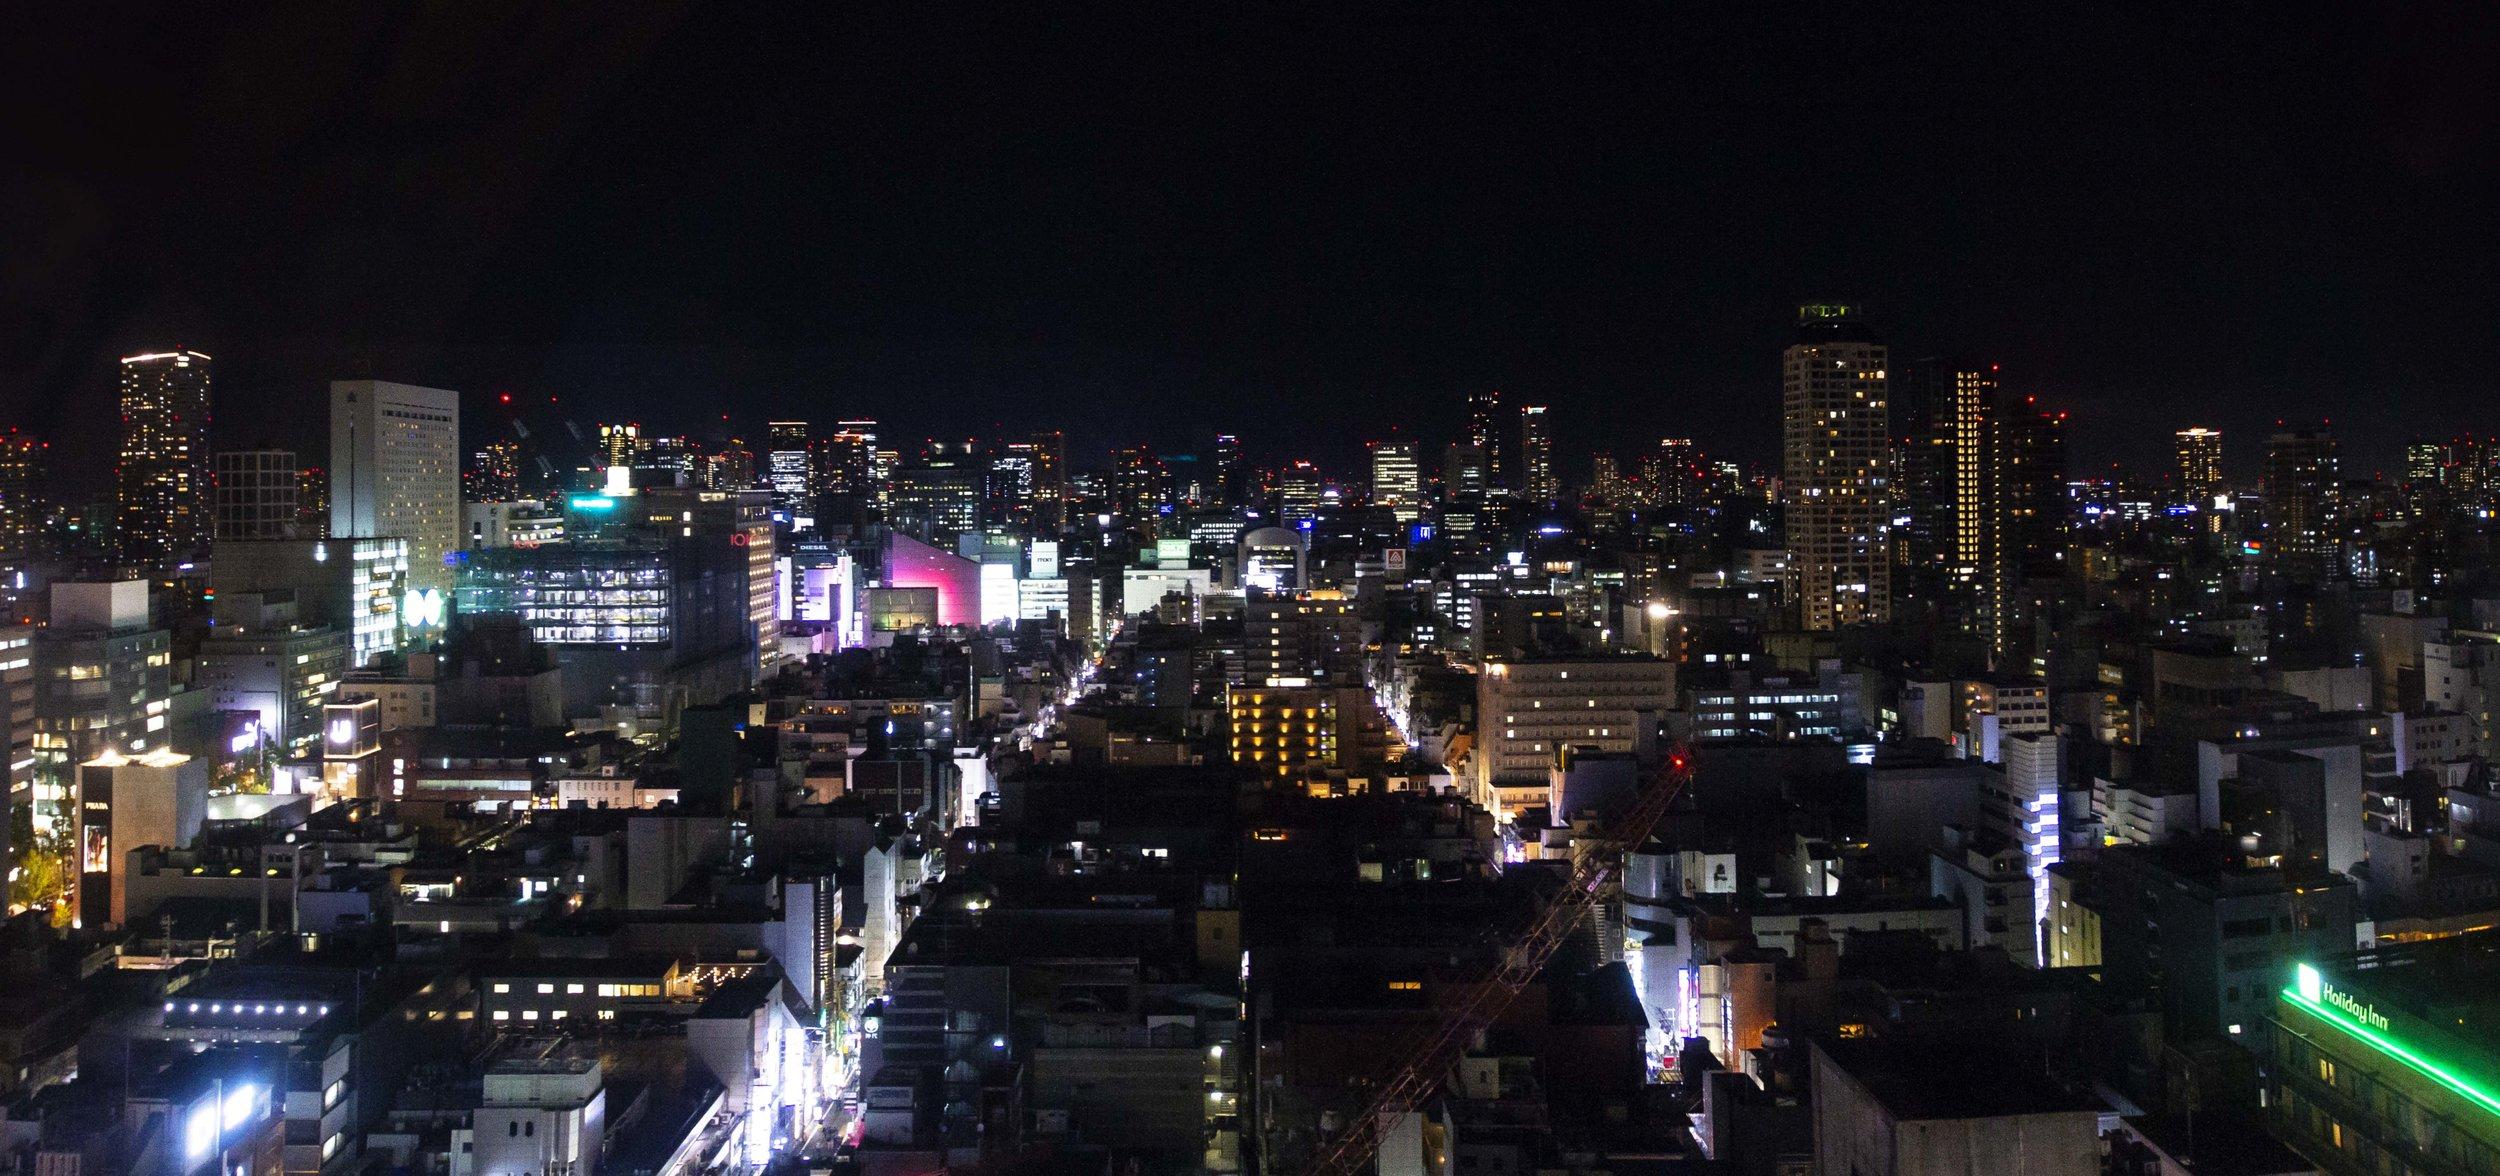 Osaka Skyline from the Ferris Wheel